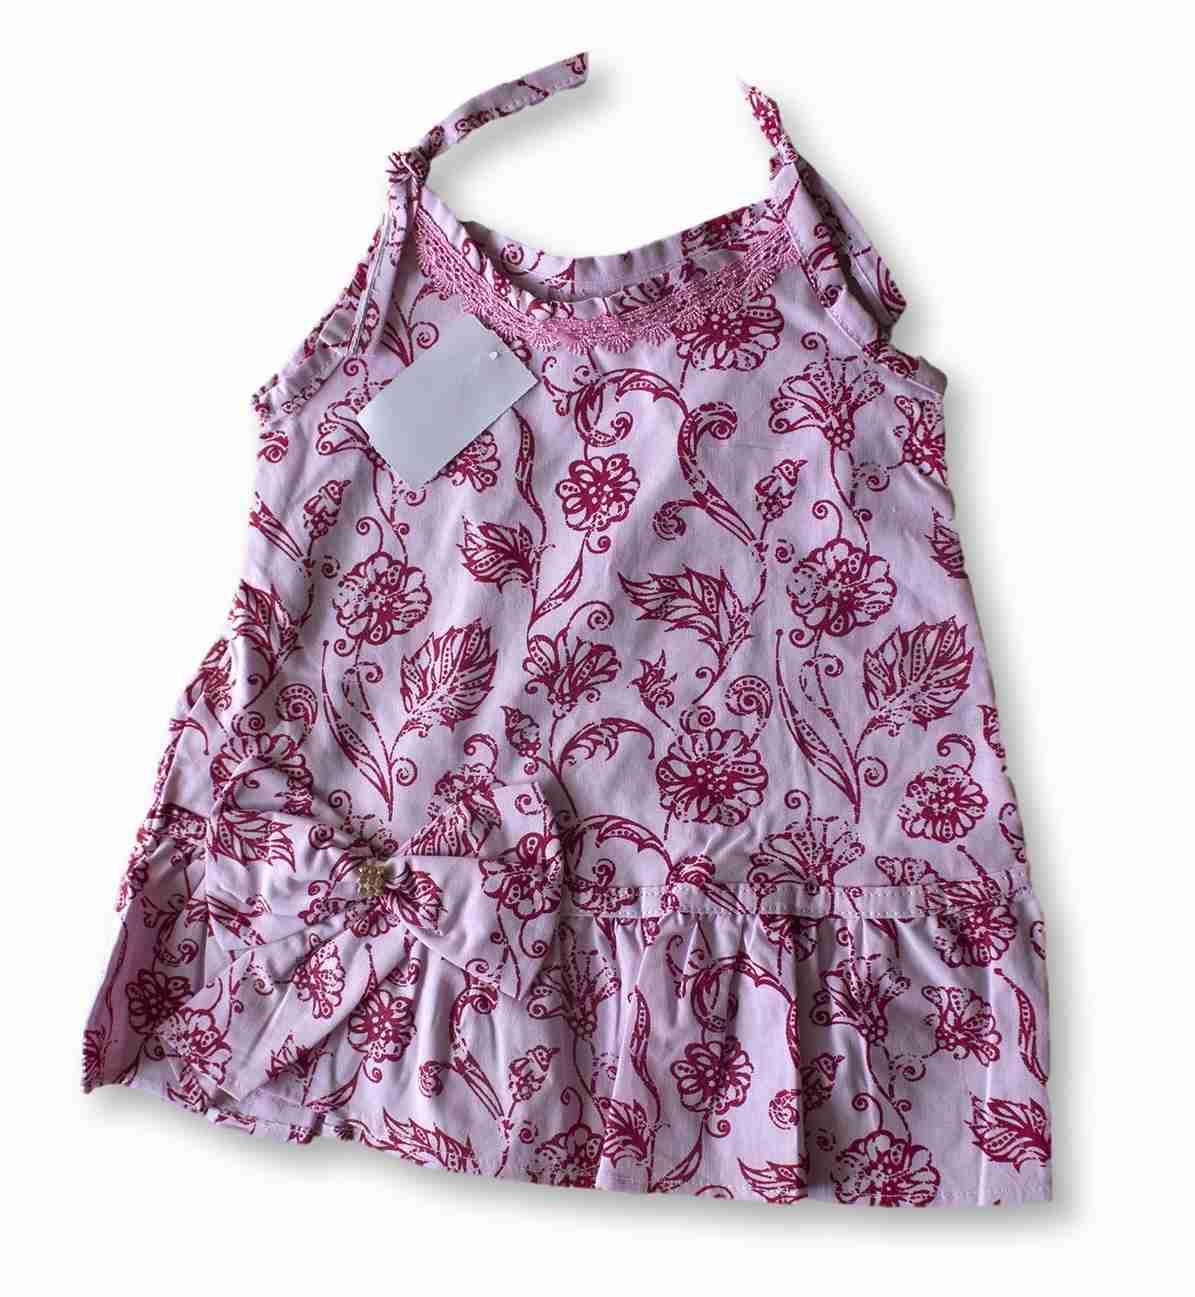 Vestido Bolero Bebê Recém Nascido Feminino Menina Cod 9090